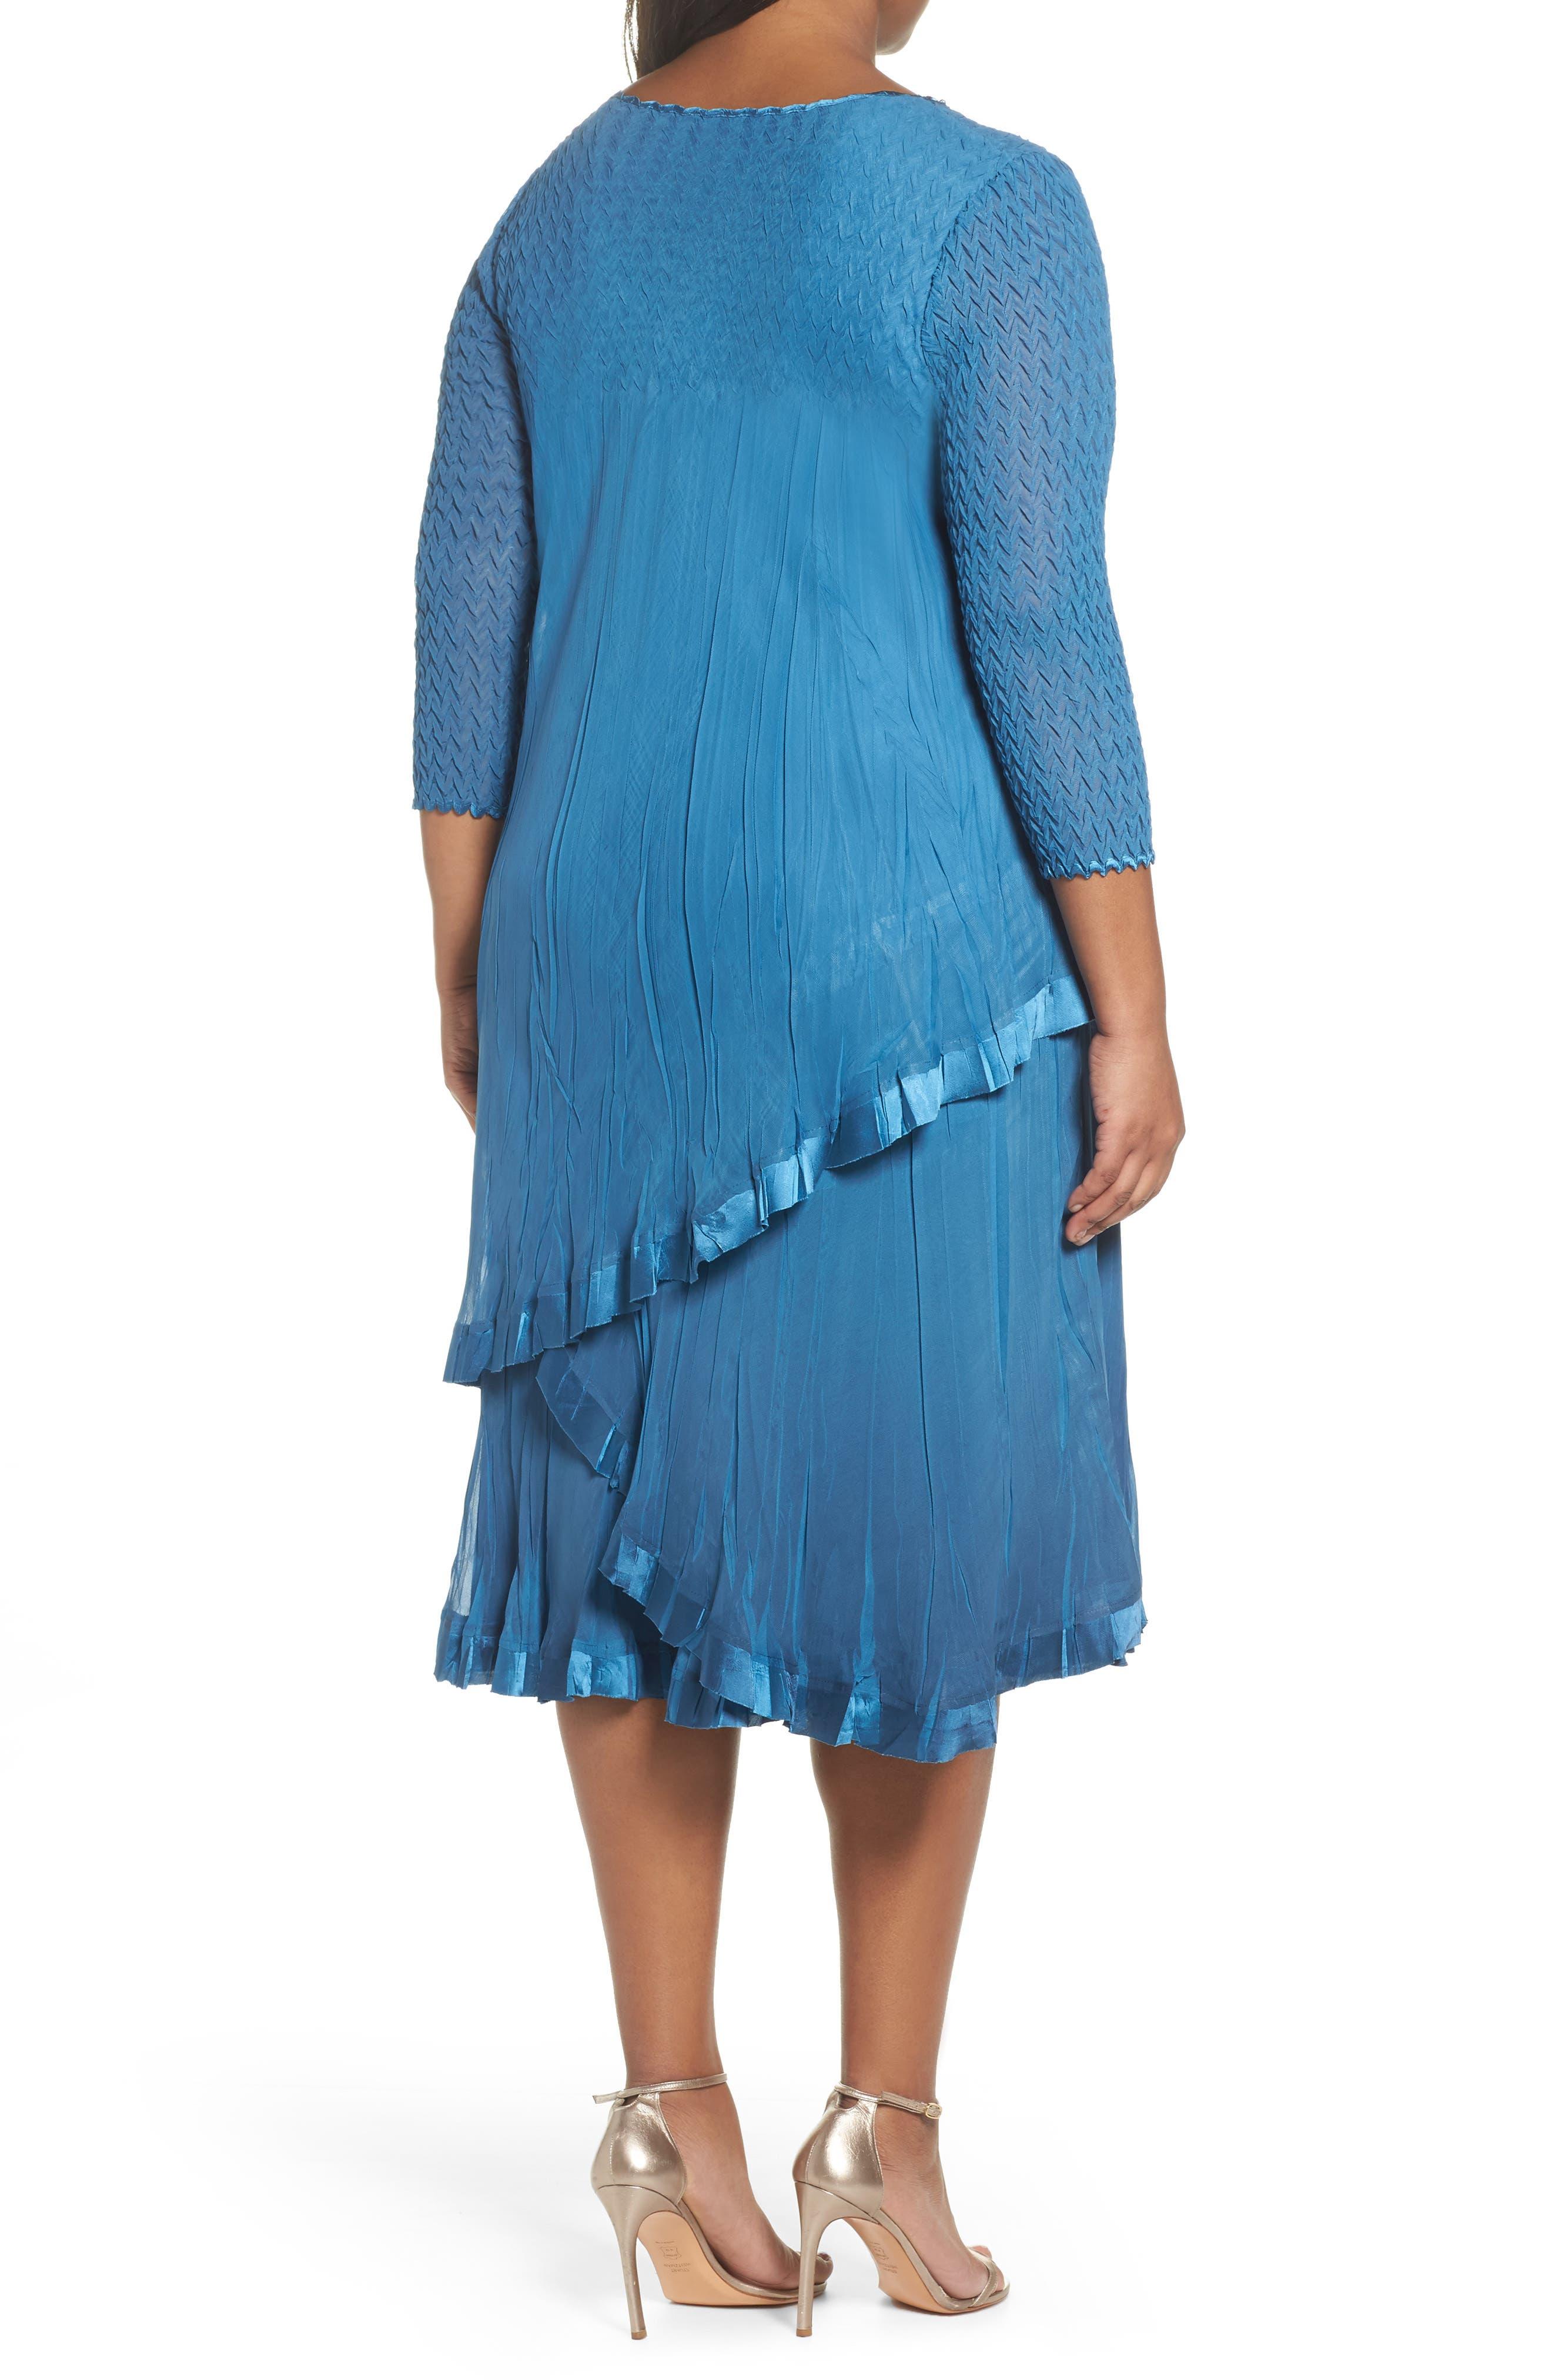 Dress Tiered Chiffon & Charmeuse Dress,                             Alternate thumbnail 2, color,                             400